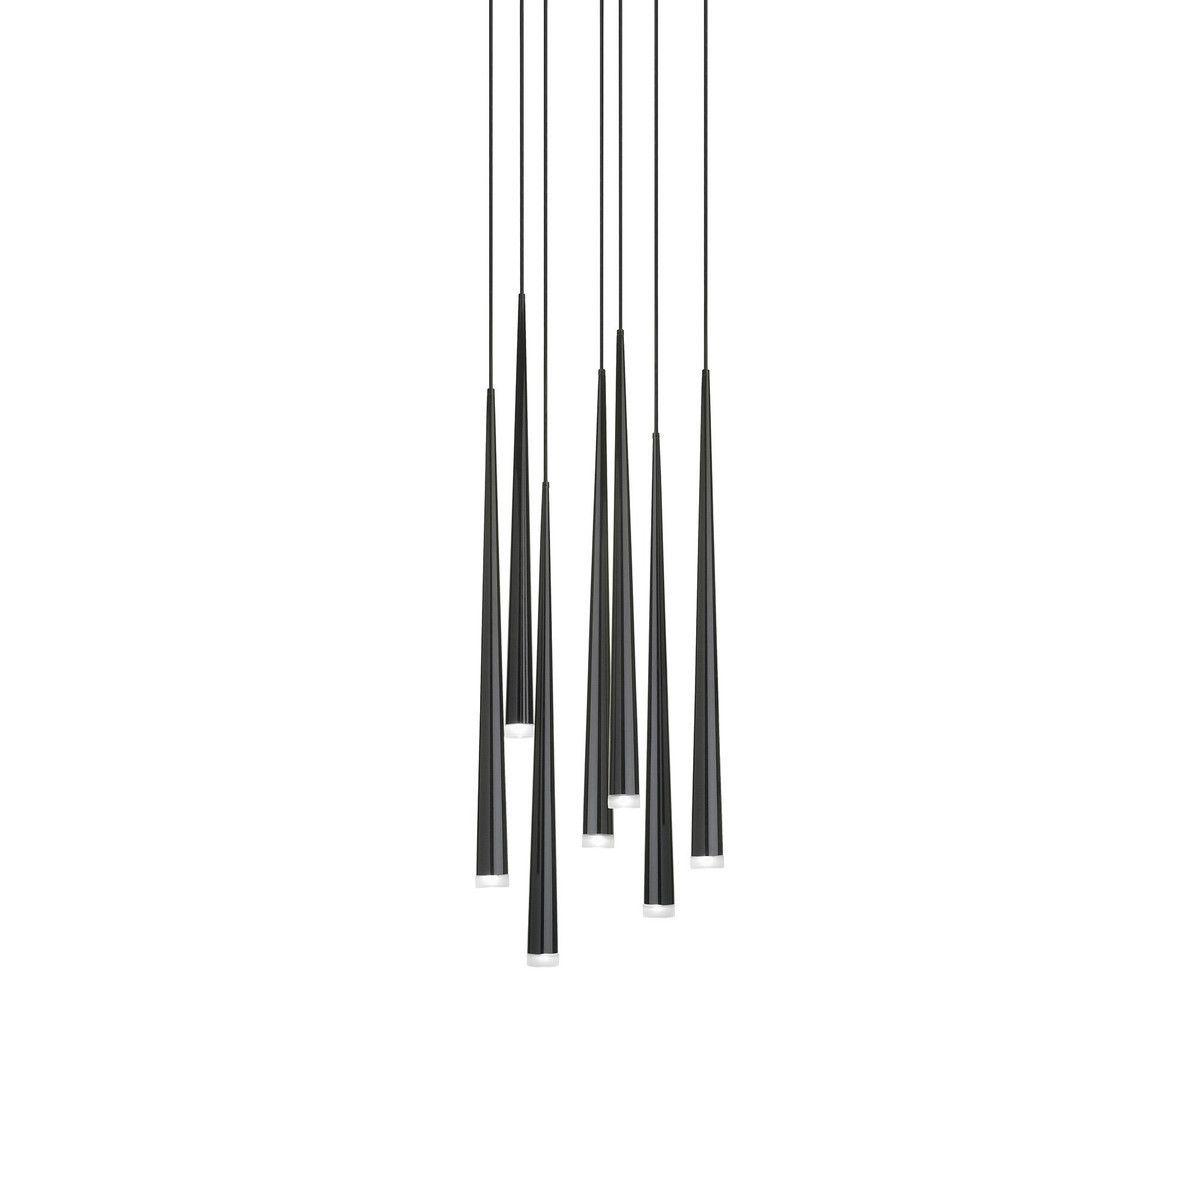 Pipe 3 led suspension lamp decor walther ambientedirect com - Vibia Slim 0916 Led Suspension Lamp Black Matt X H